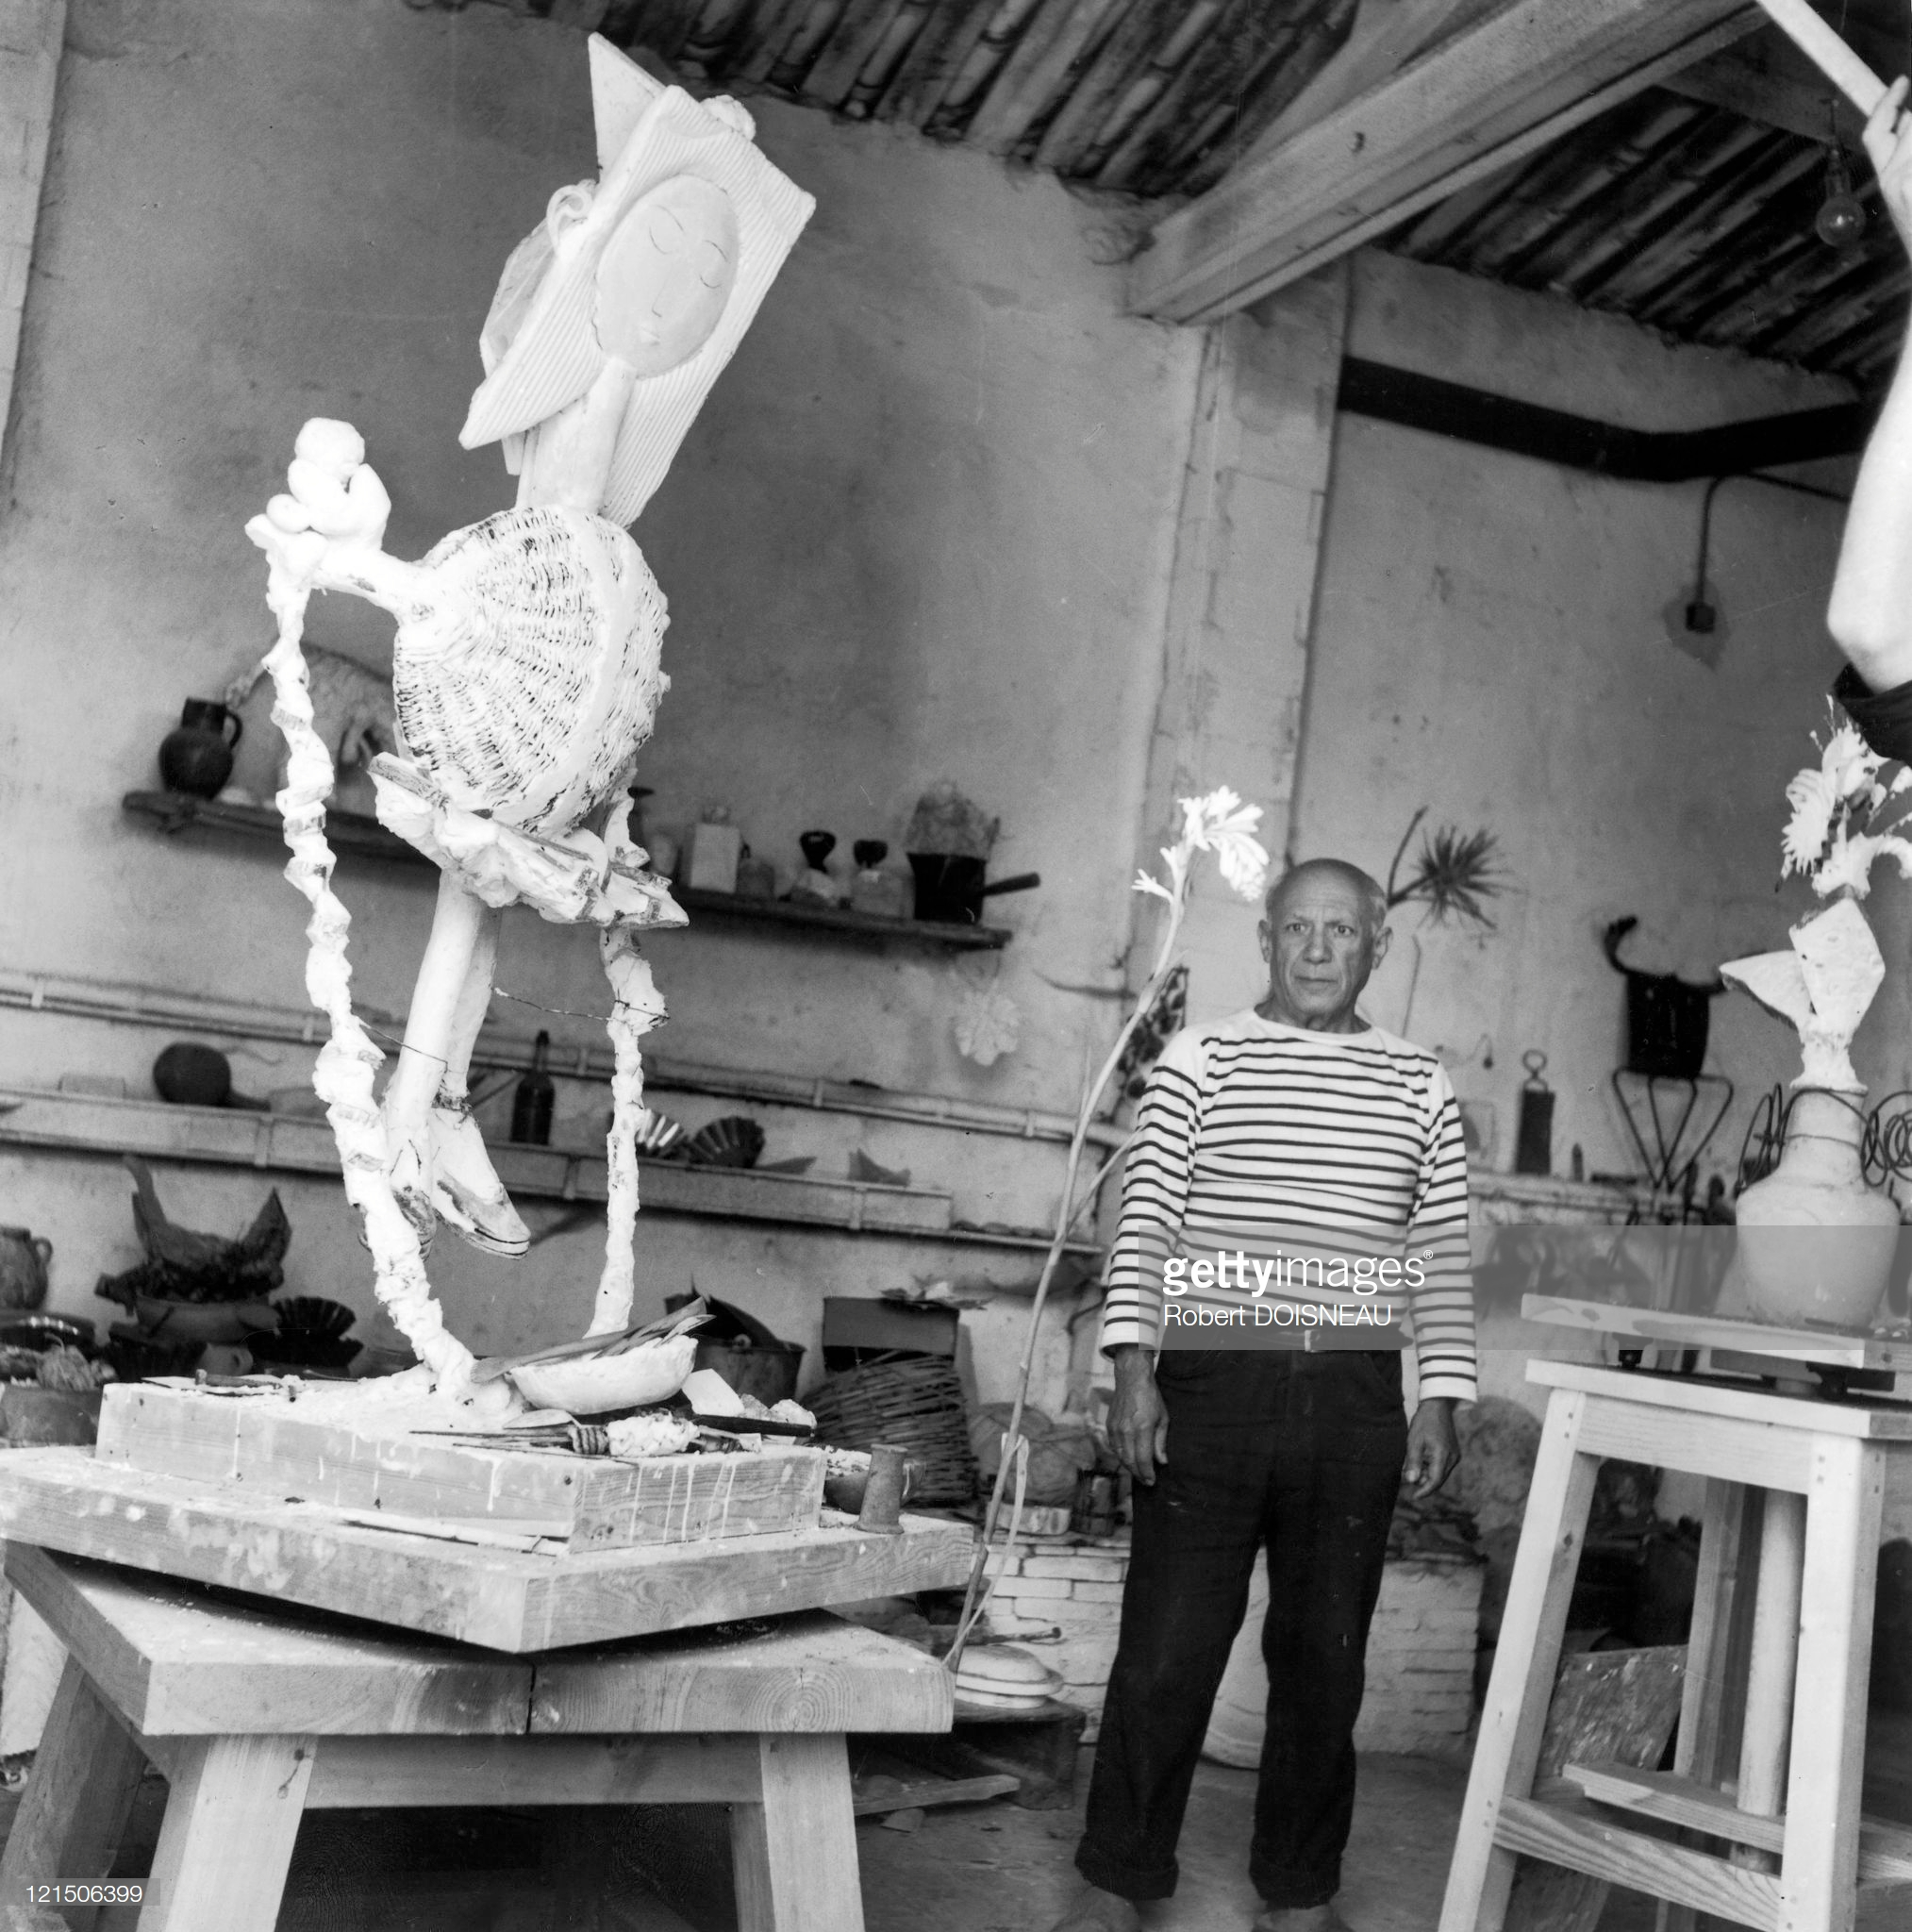 1952. Пабло Пикассо, Валлорис, сентябрь